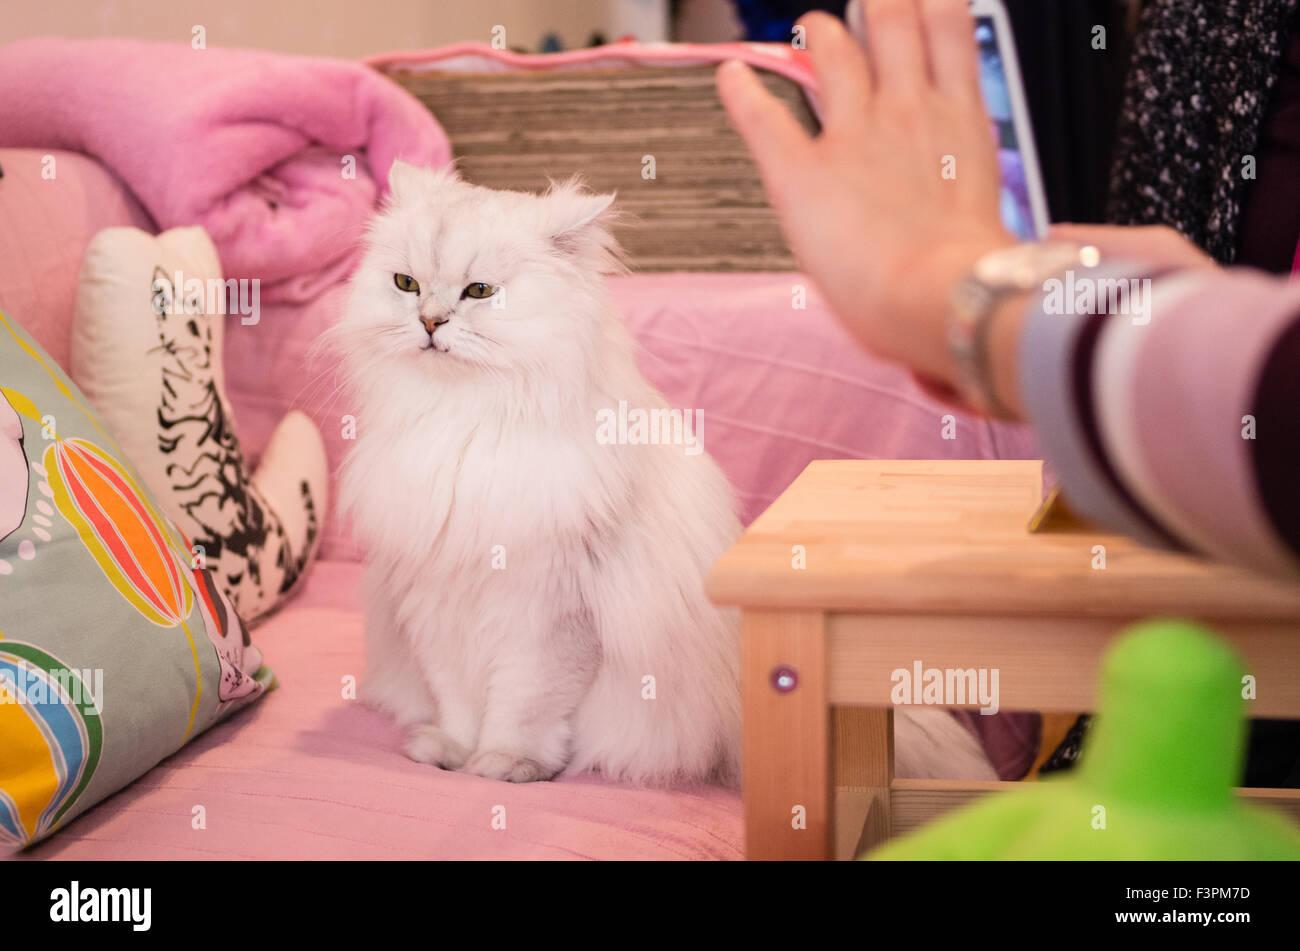 Cat posing at Happy Neko Cat Cafe in Shibuya, Tokyo, Japan Stock Photo